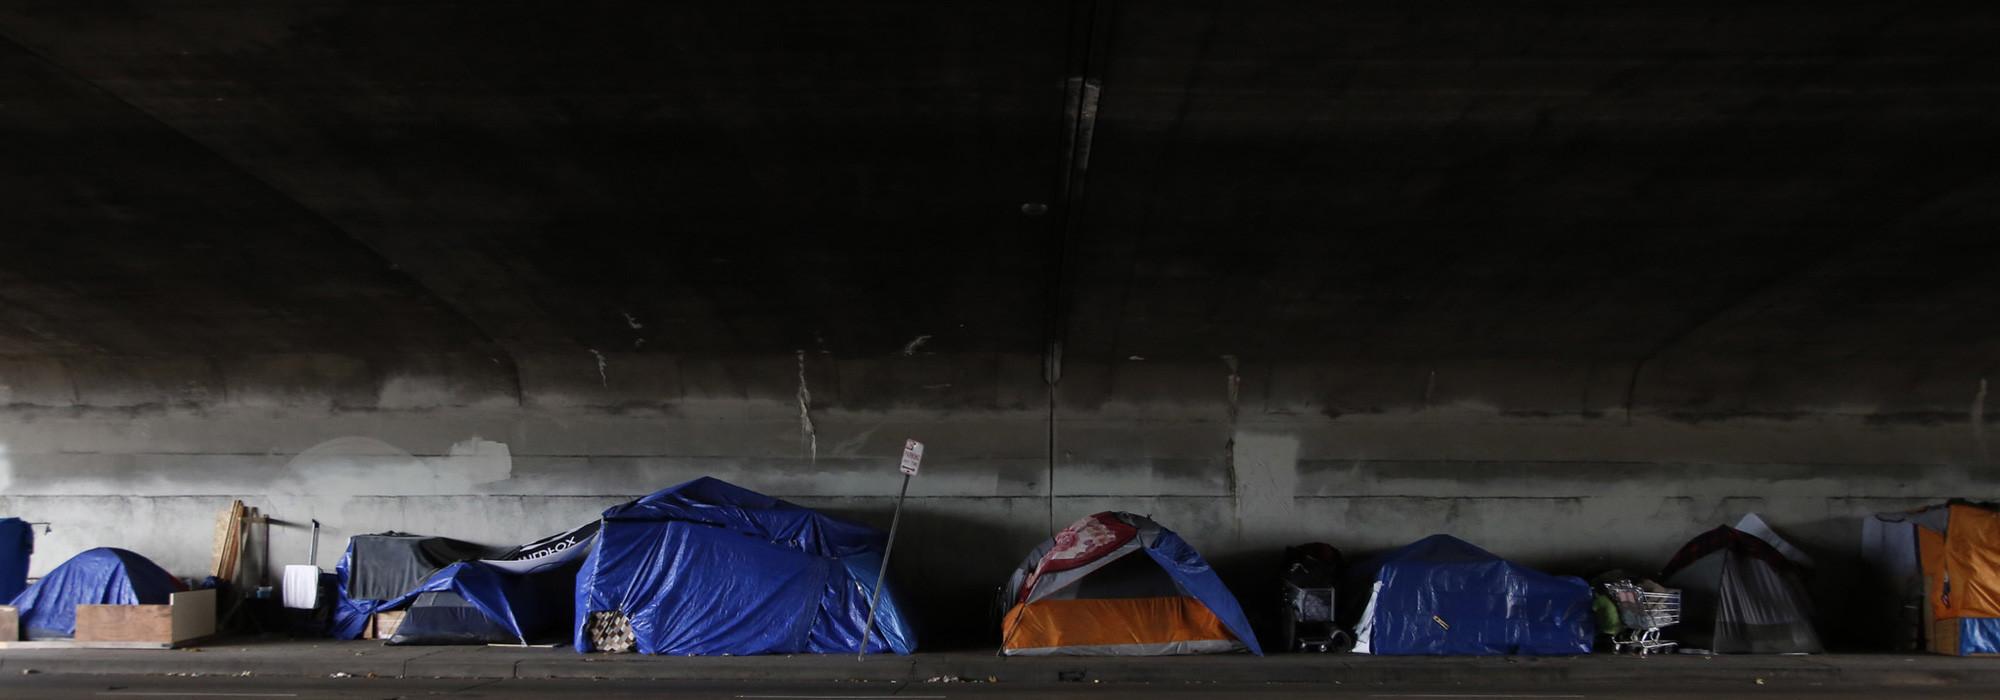 la-tent-image-20150615.jpg